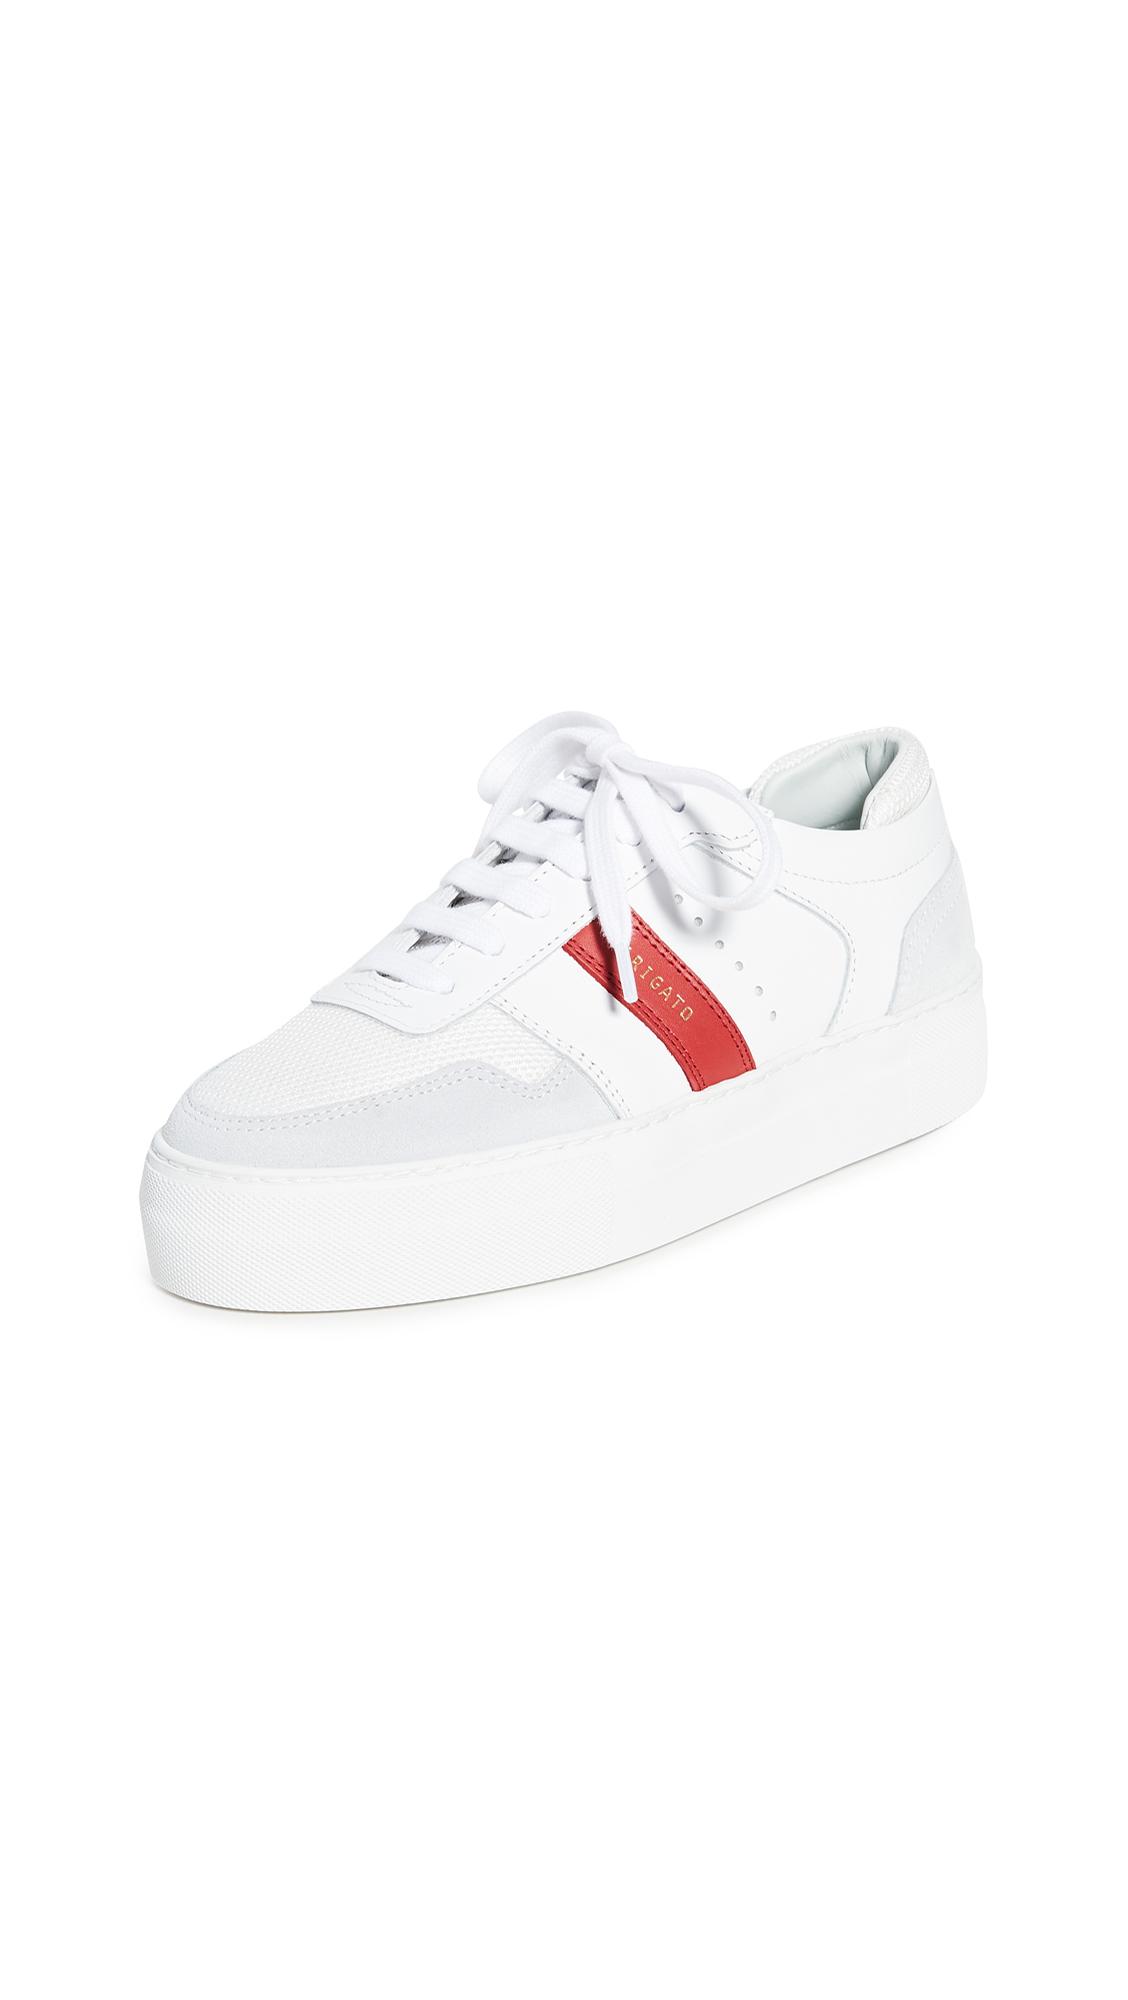 Axel Arigato Platform Sneakers - White/Red